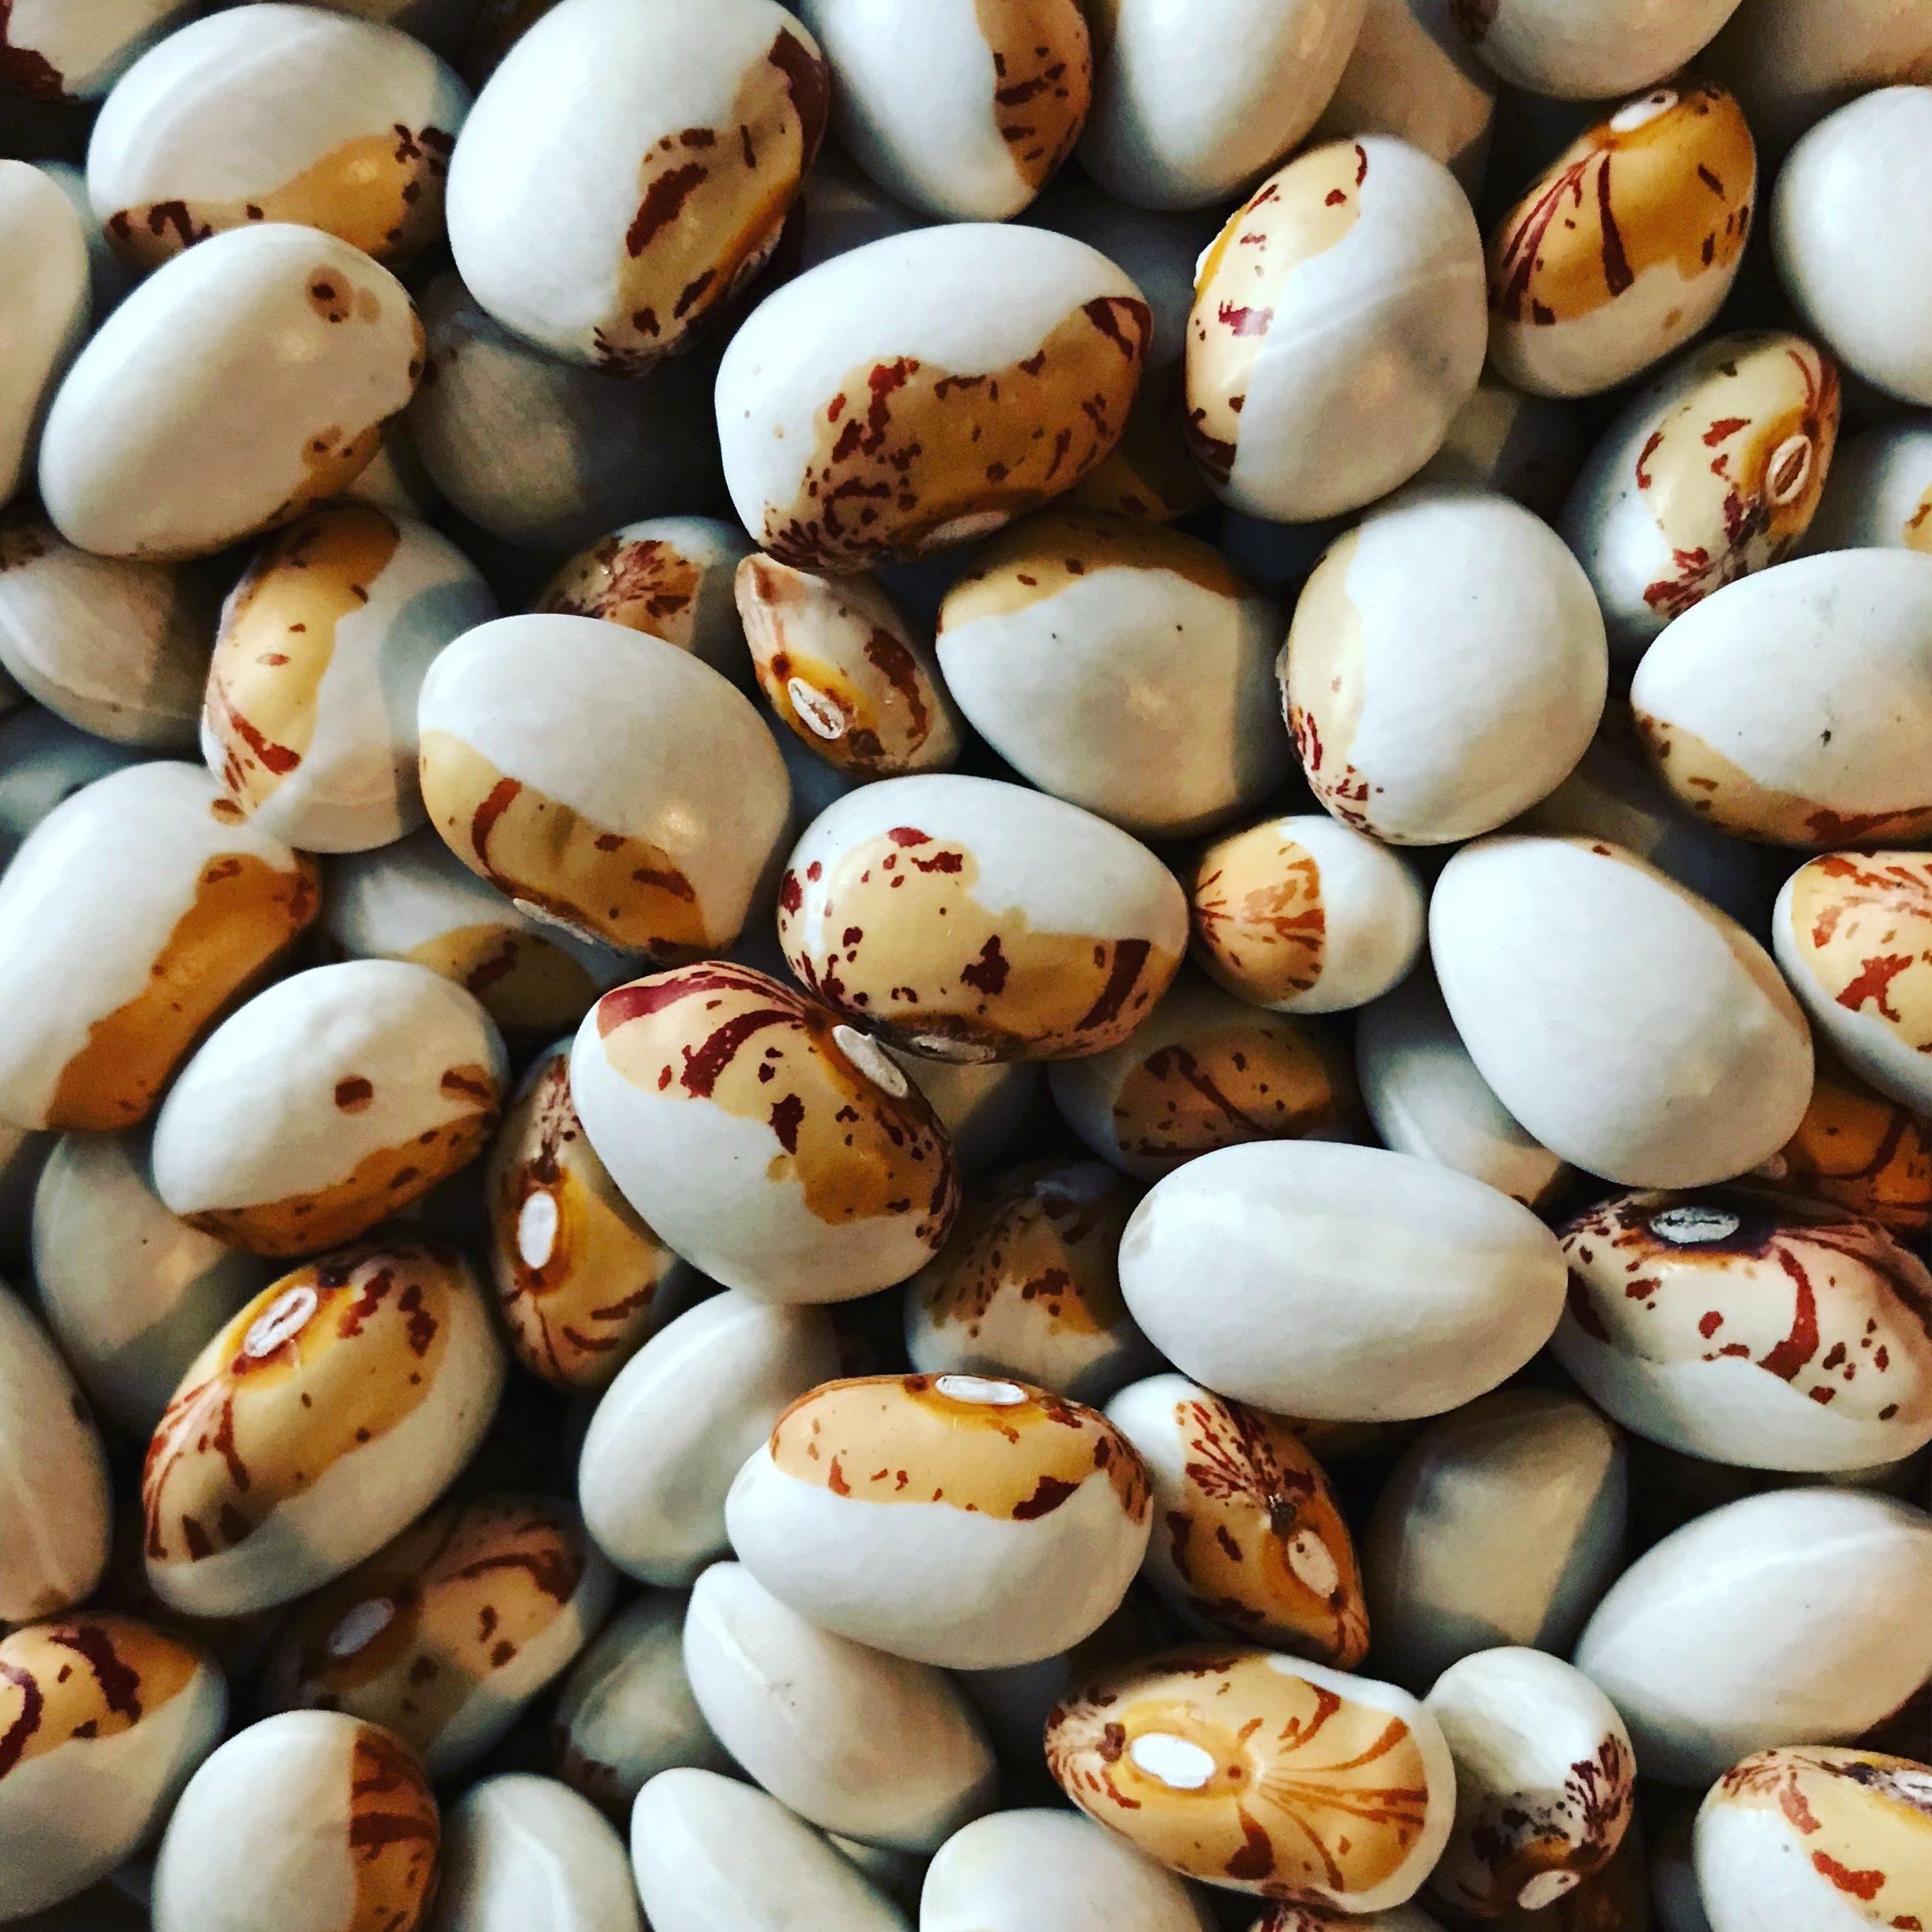 Shield bean harvest